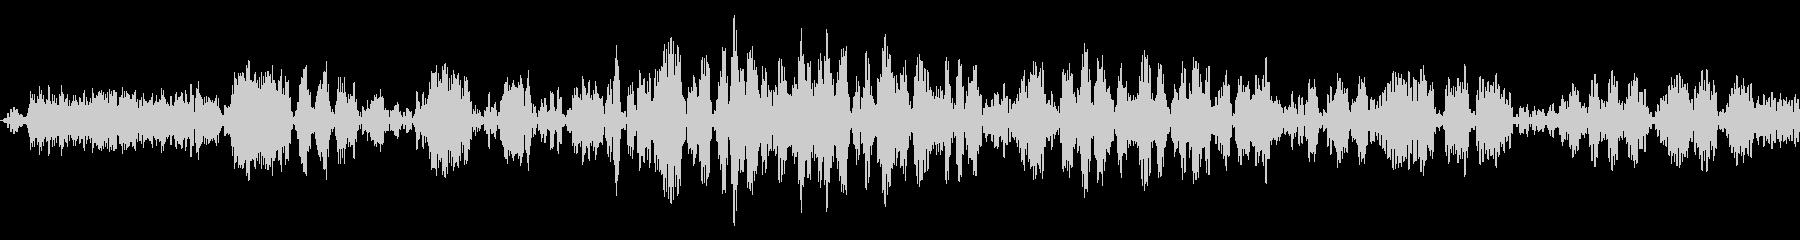 SciFi EC01_89_5の未再生の波形